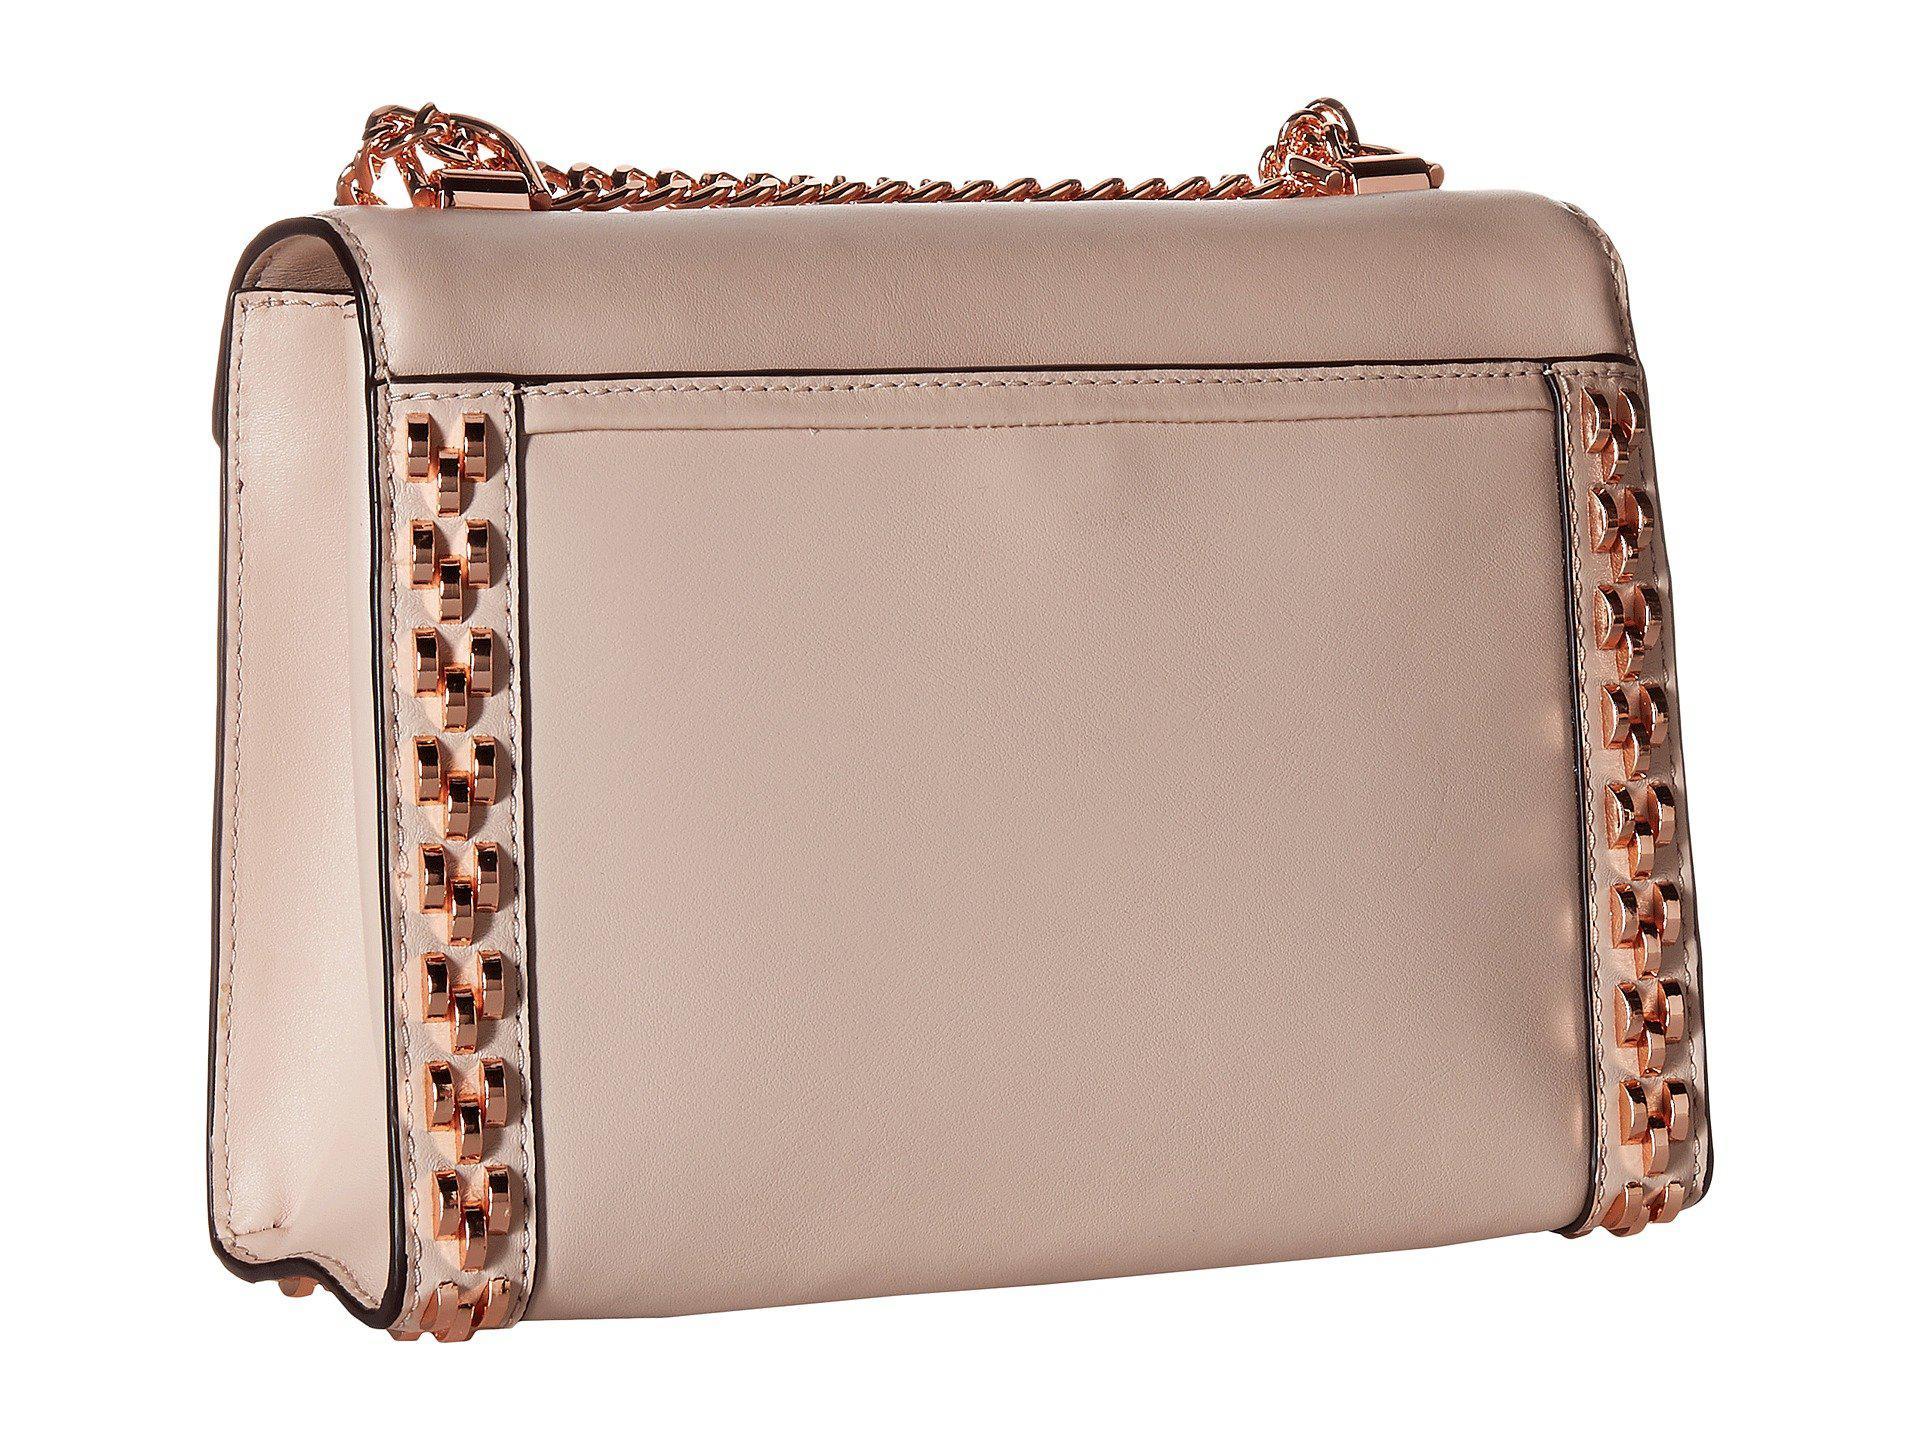 8dc2489e8c6027 ... australia michael michael kors whitney large shoulder soft pink  shoulder handbags lyst. view fullscreen e4395